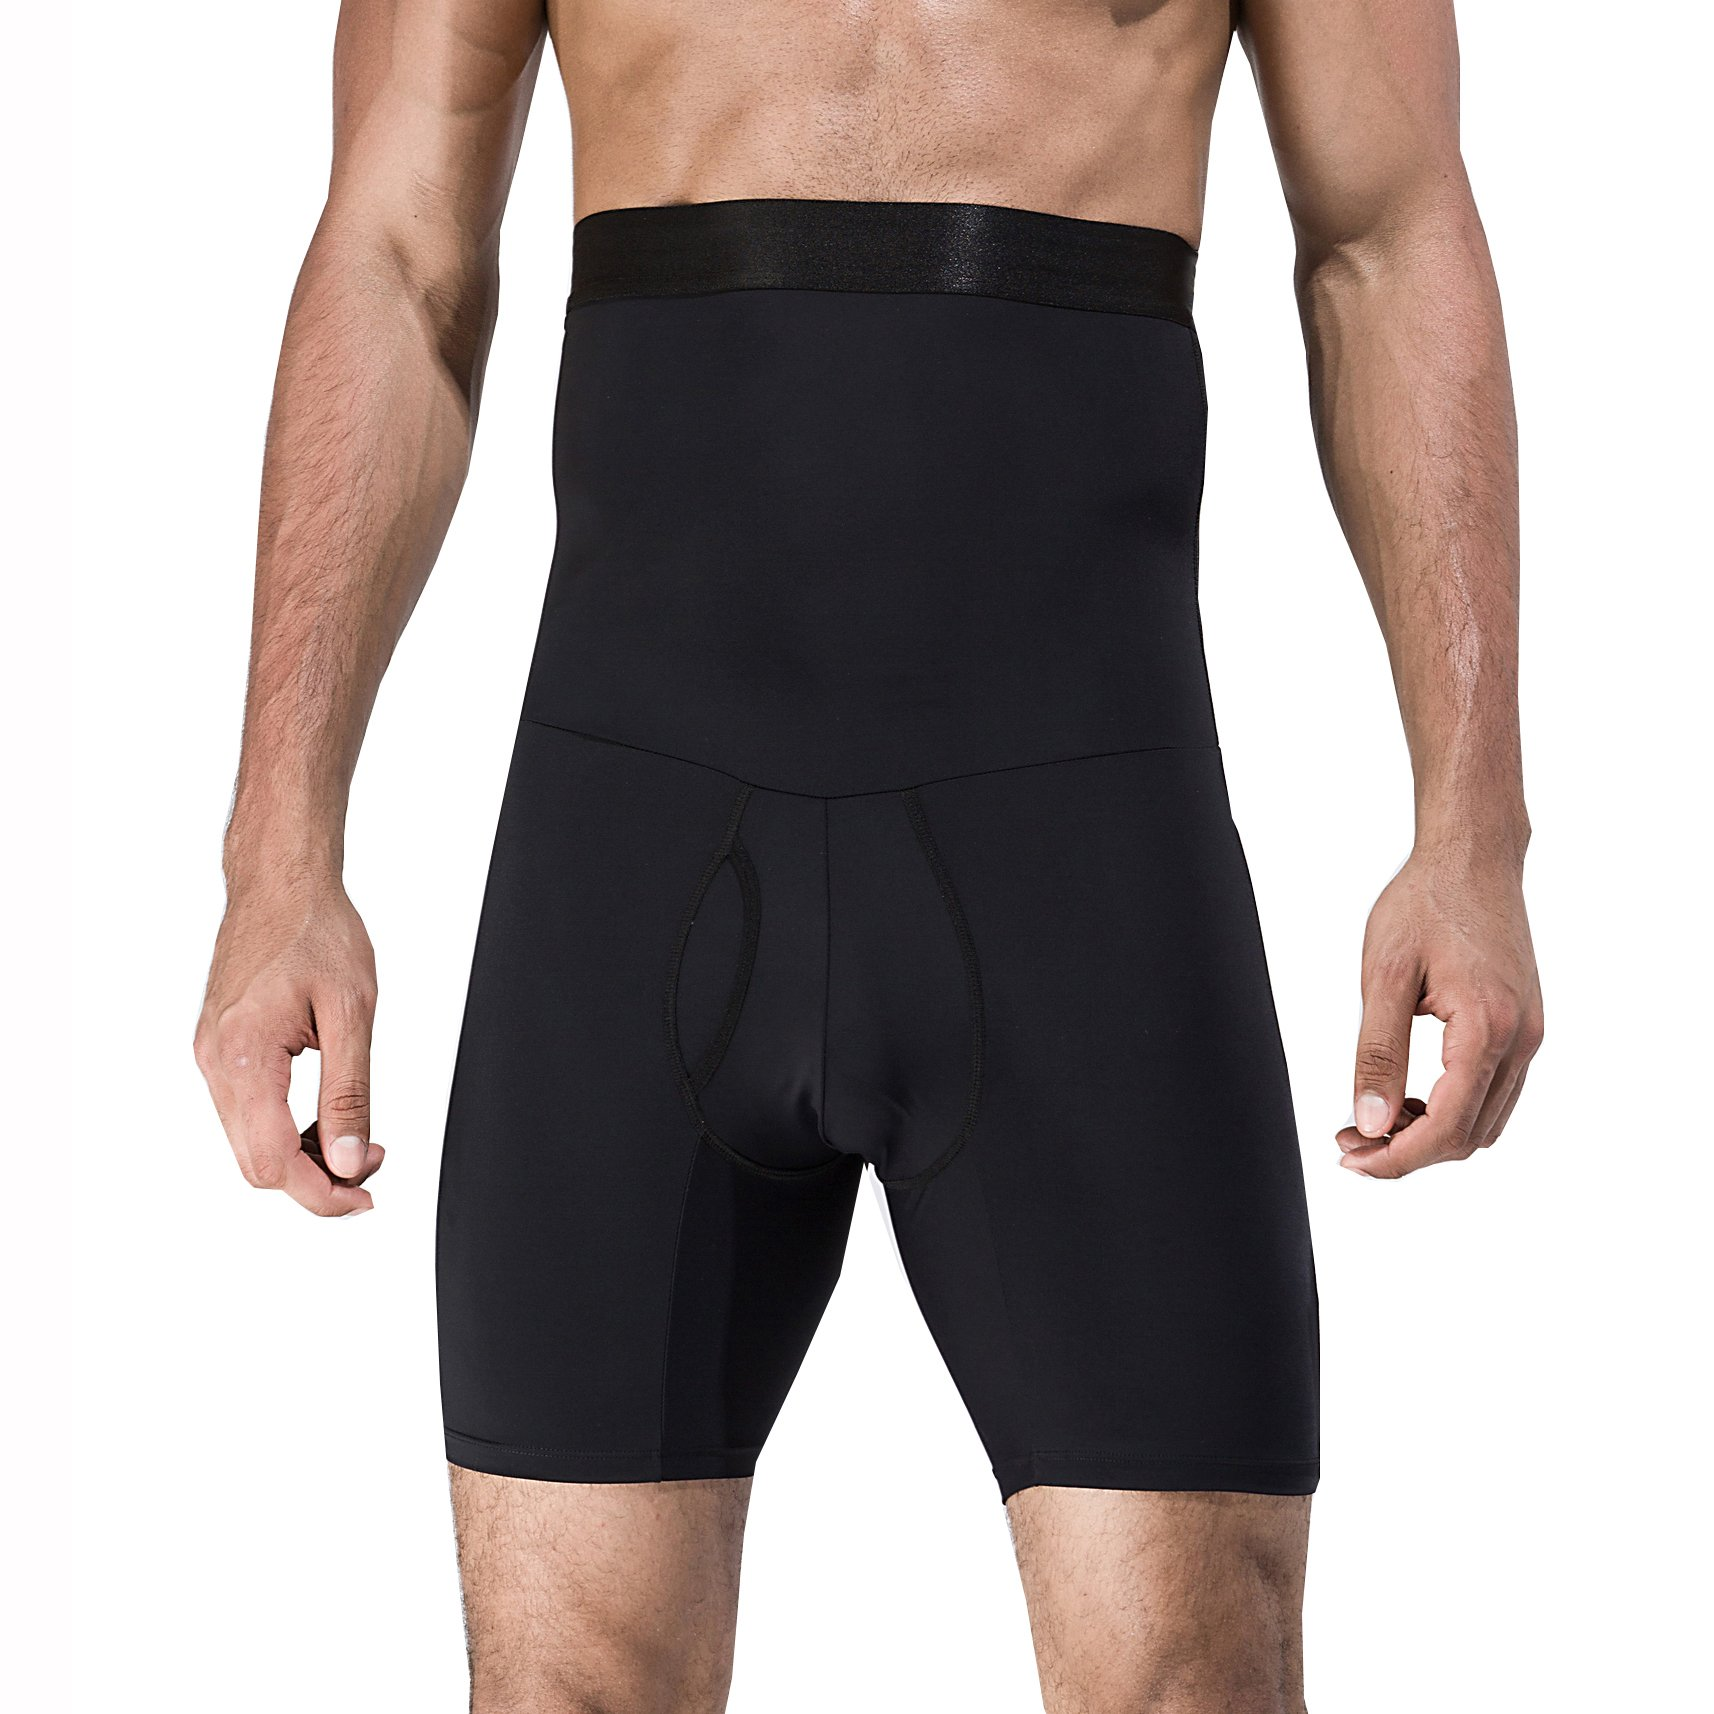 iYunyi Men's High Waist Slimming Body Shaper Tummy Control Shapewear Waist Abdomen Trimming Boxer Brief (Black, Large/36.22-42.13inch)